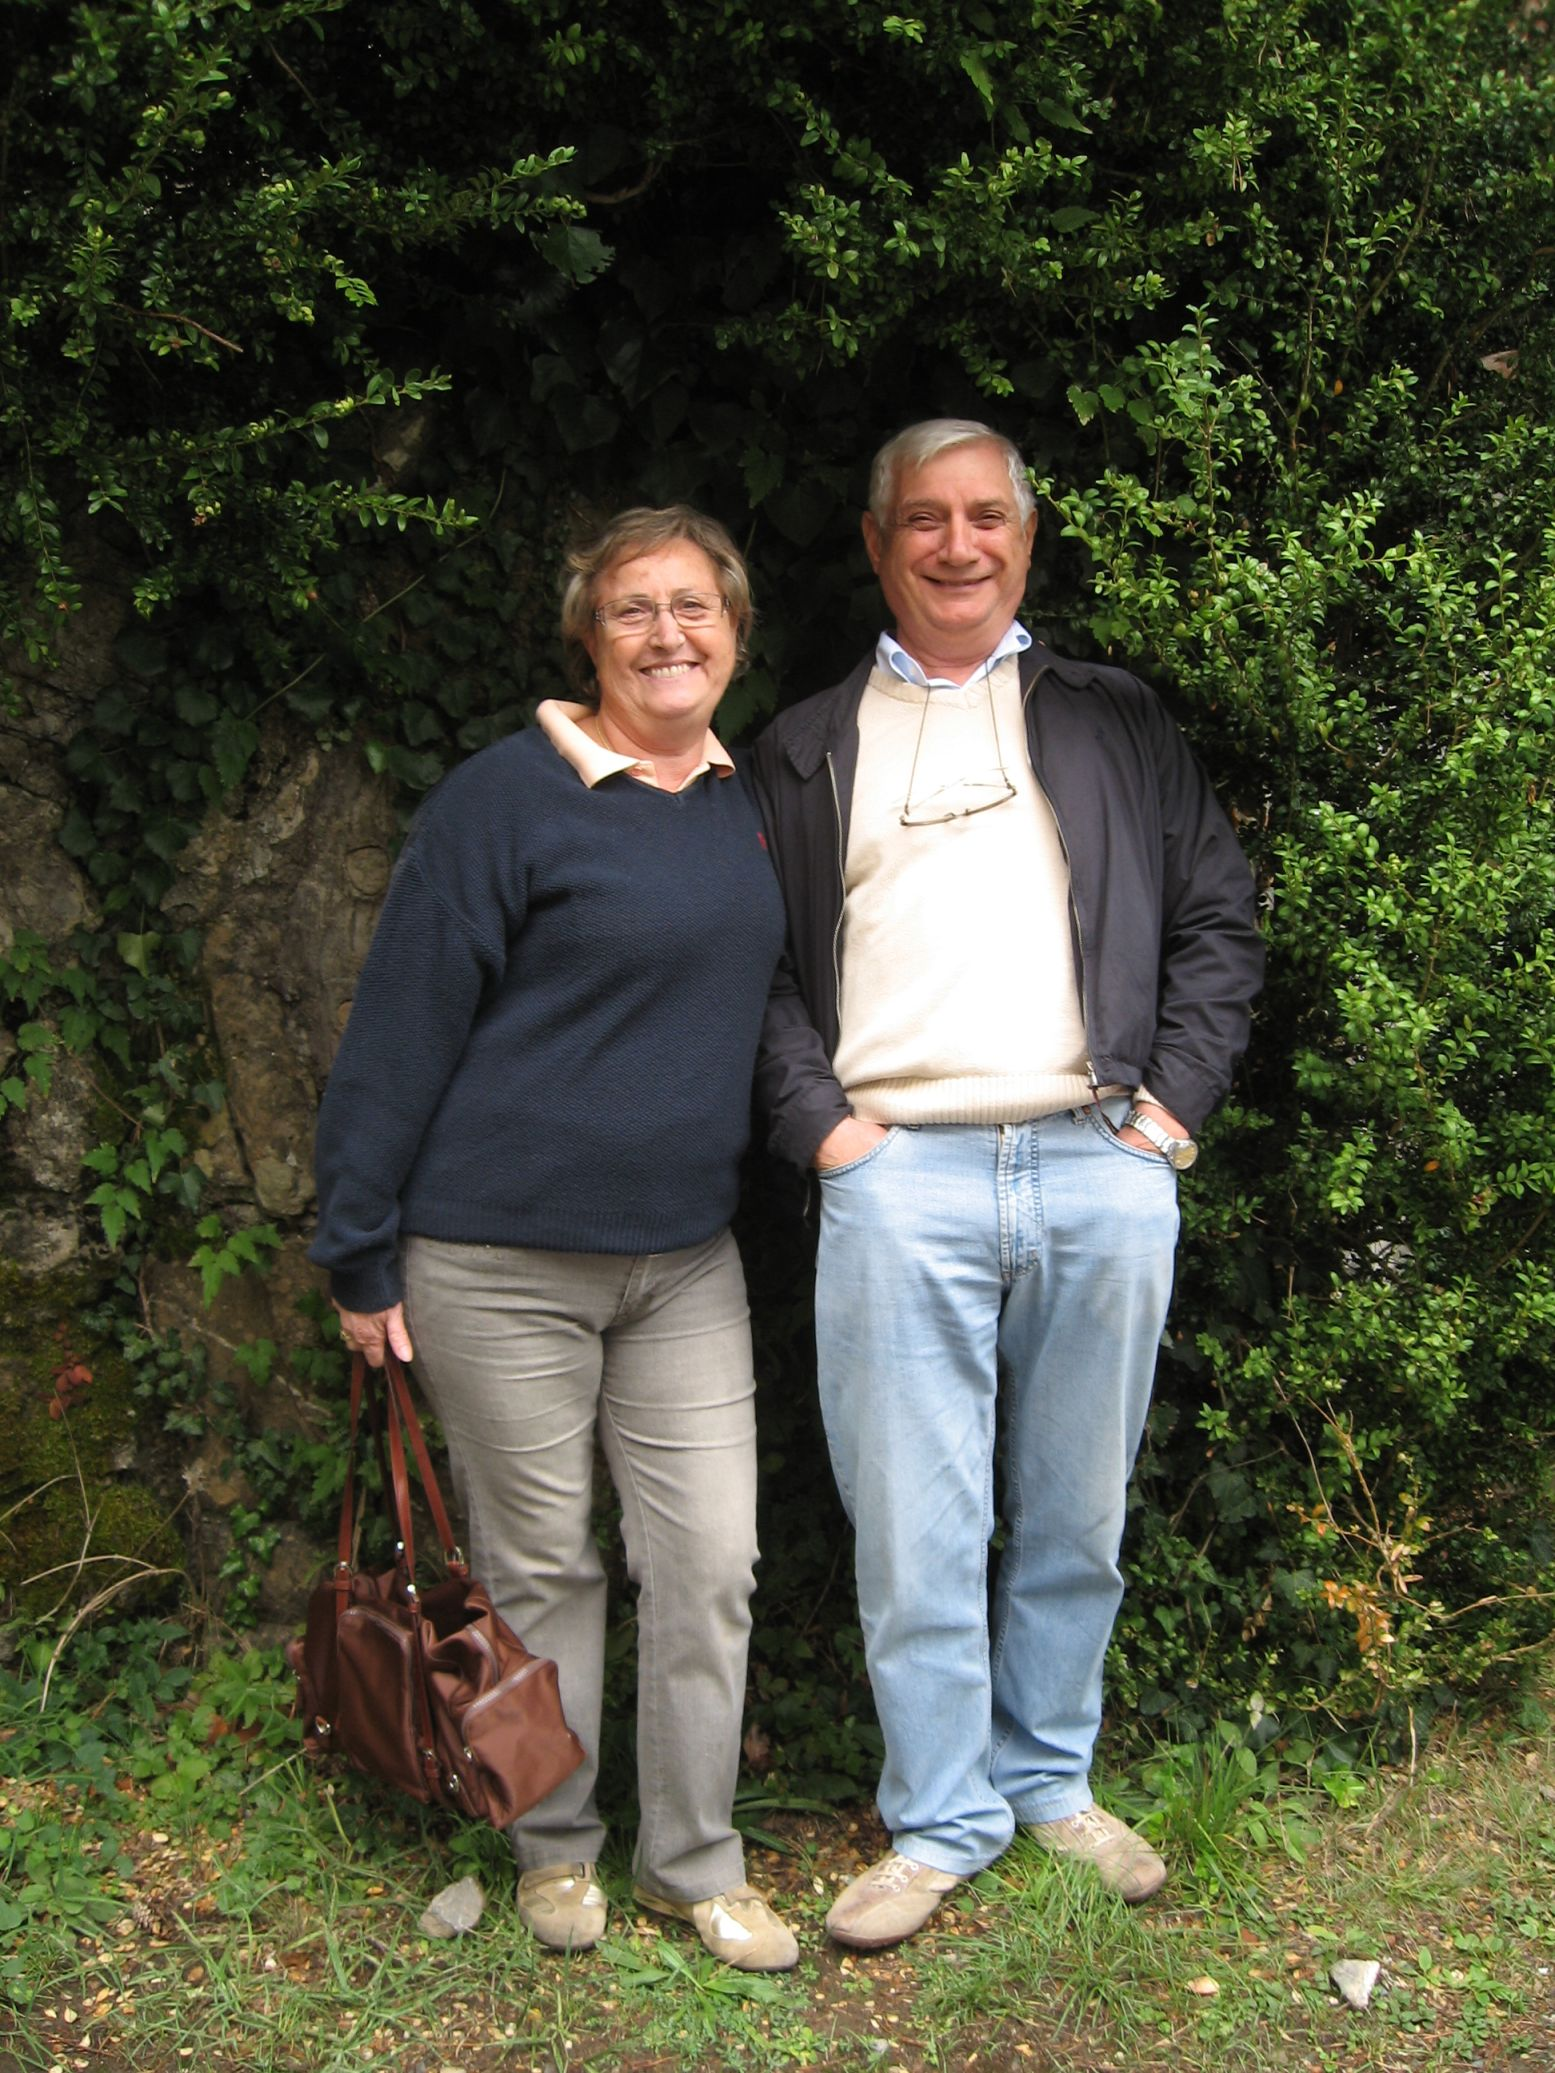 Bivacco_Persone_Impegnate_Torriglia-2009-09-20--17.18.18